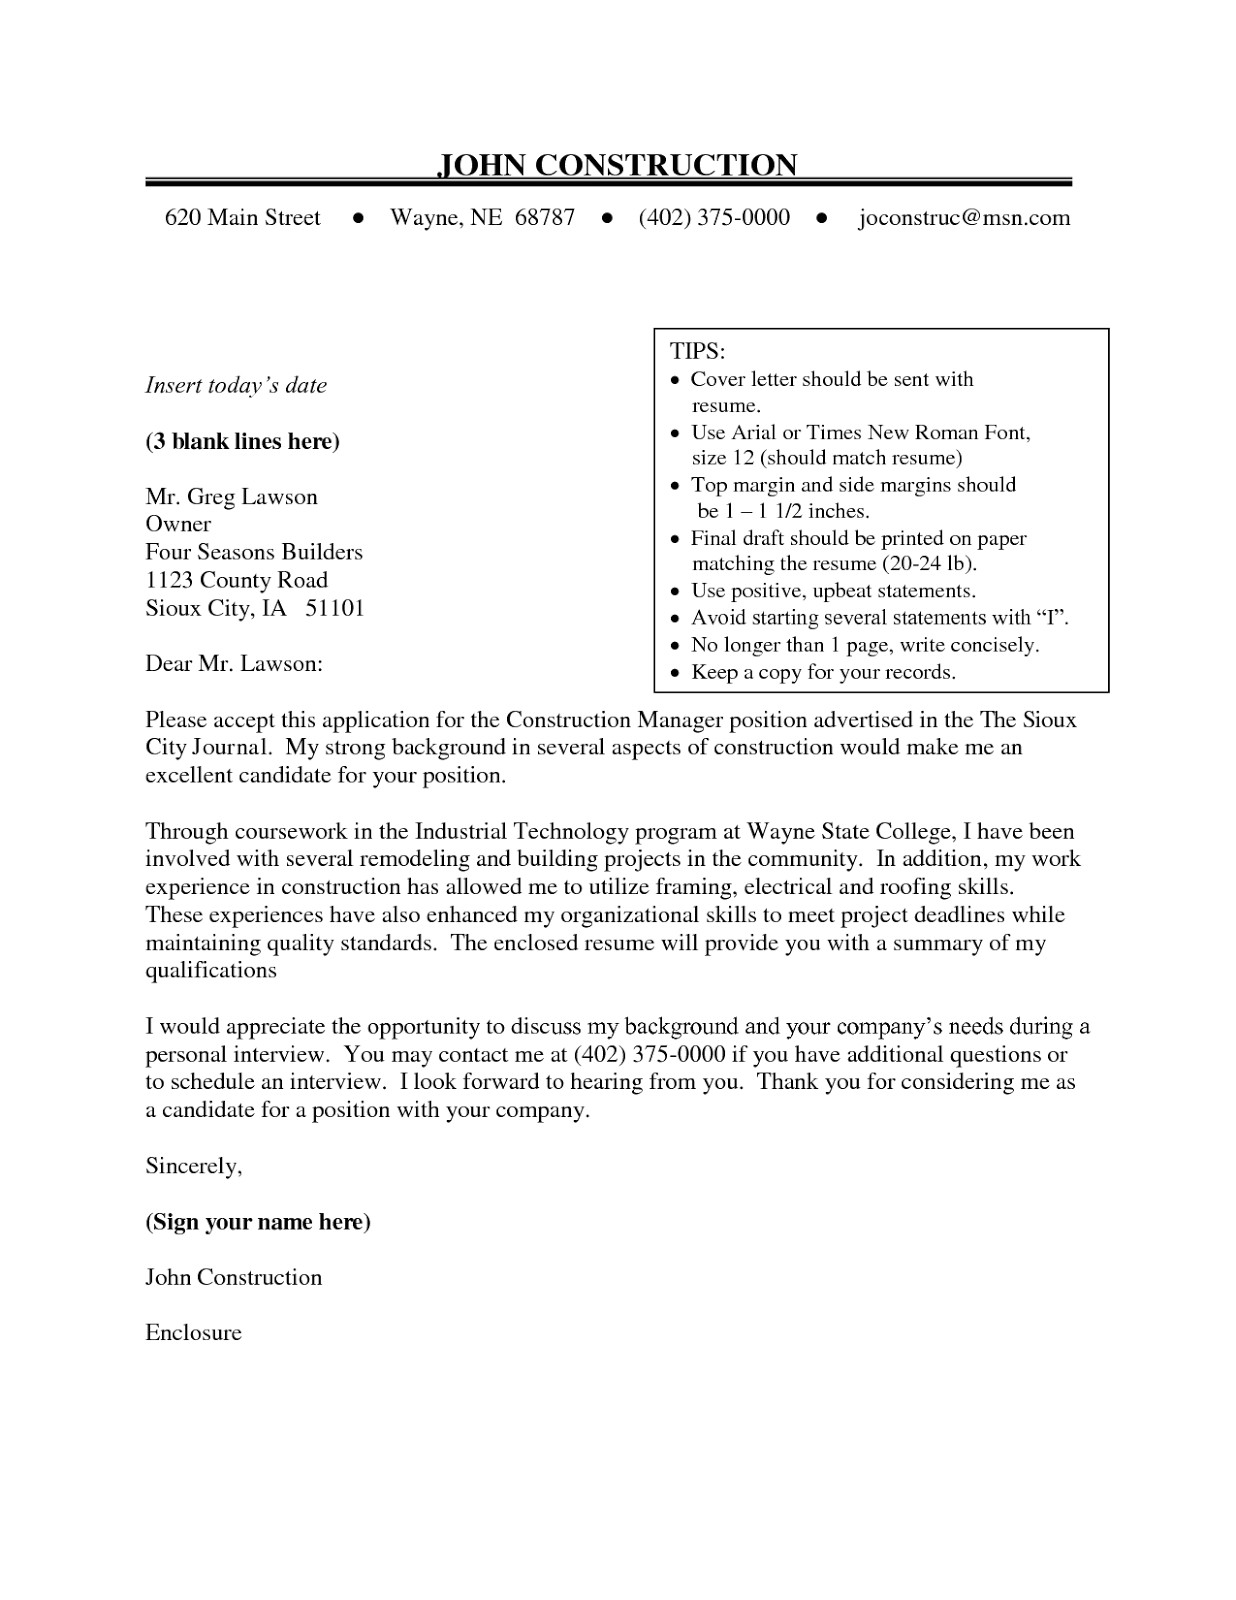 font size resume 2016